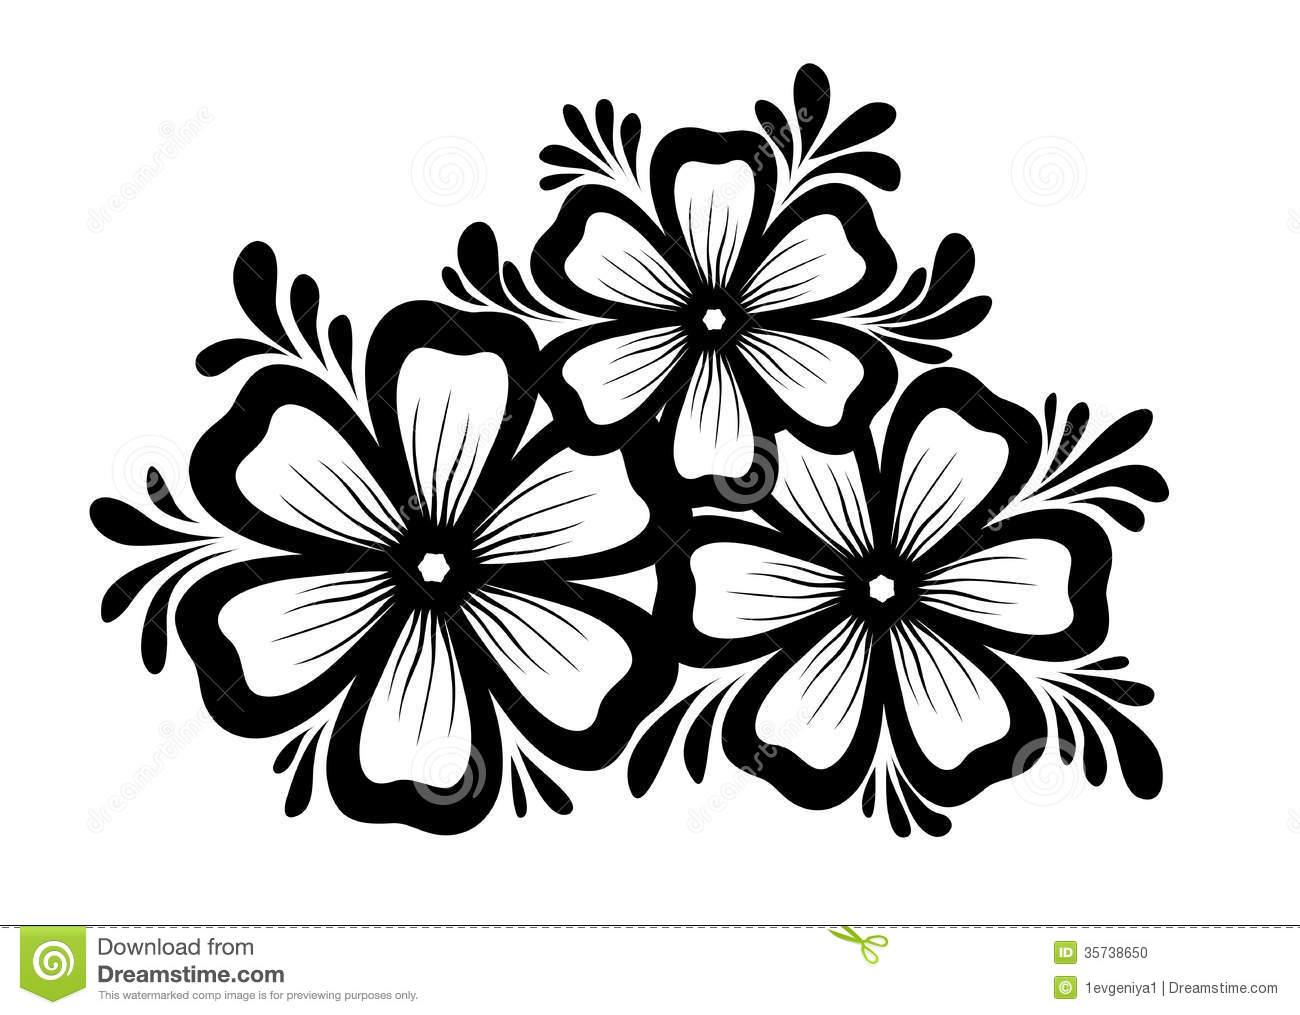 Black and White Flower Floral Design